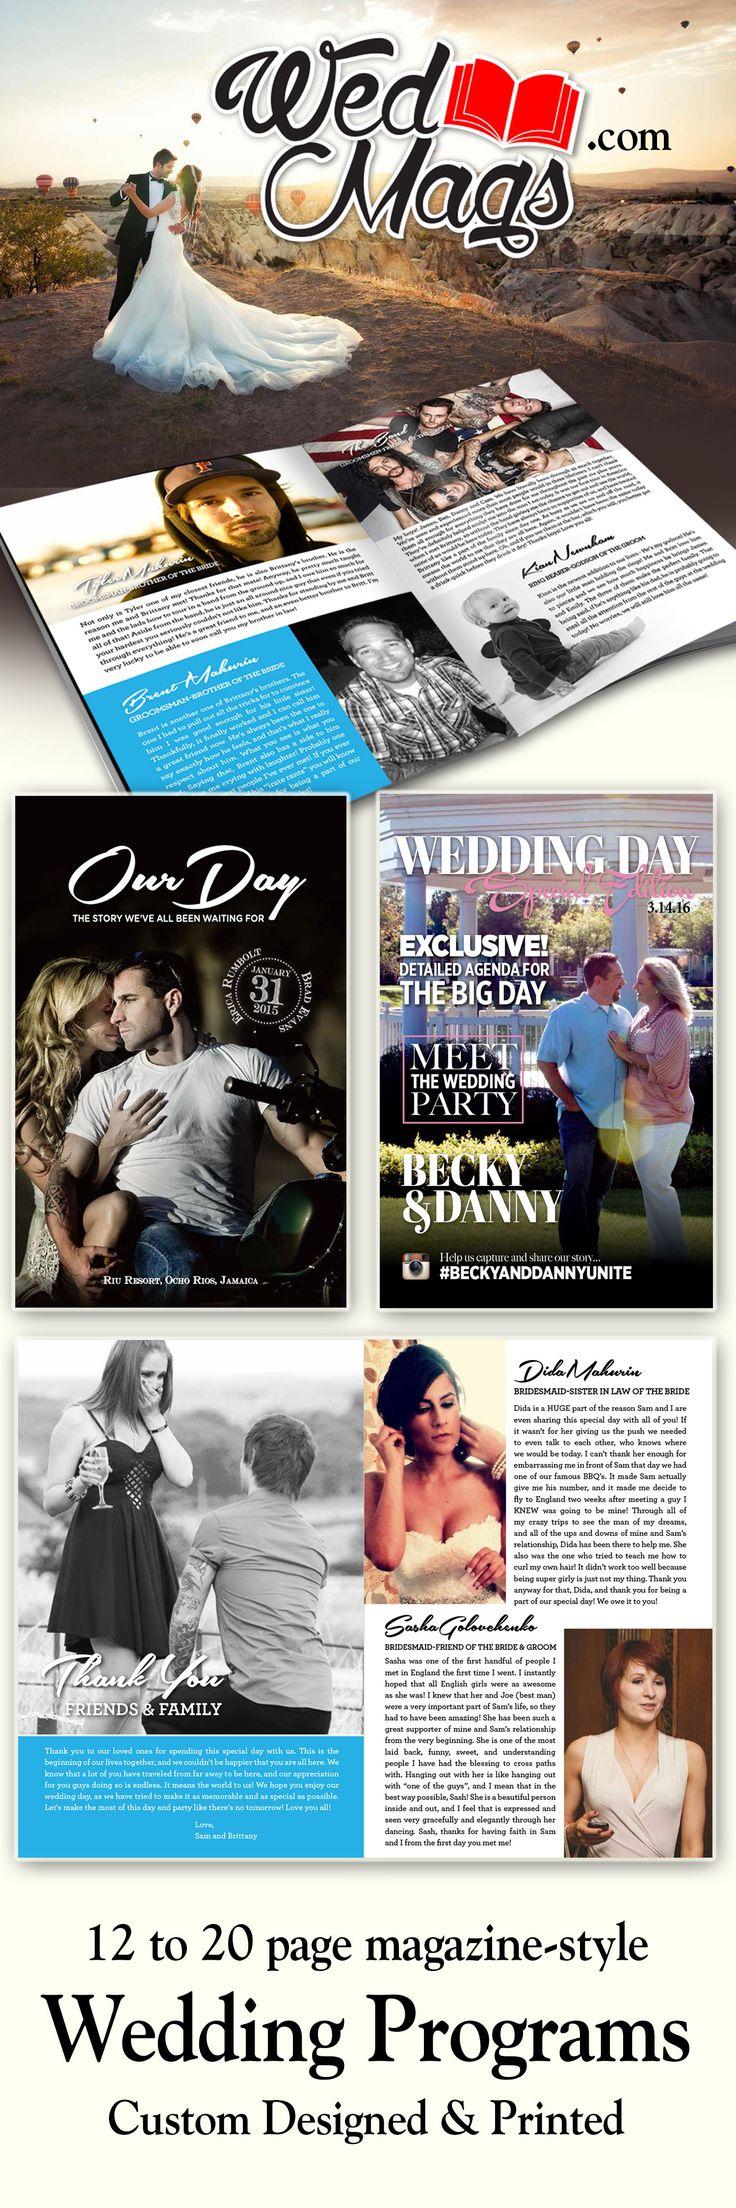 We design and print custom Wedding Programs